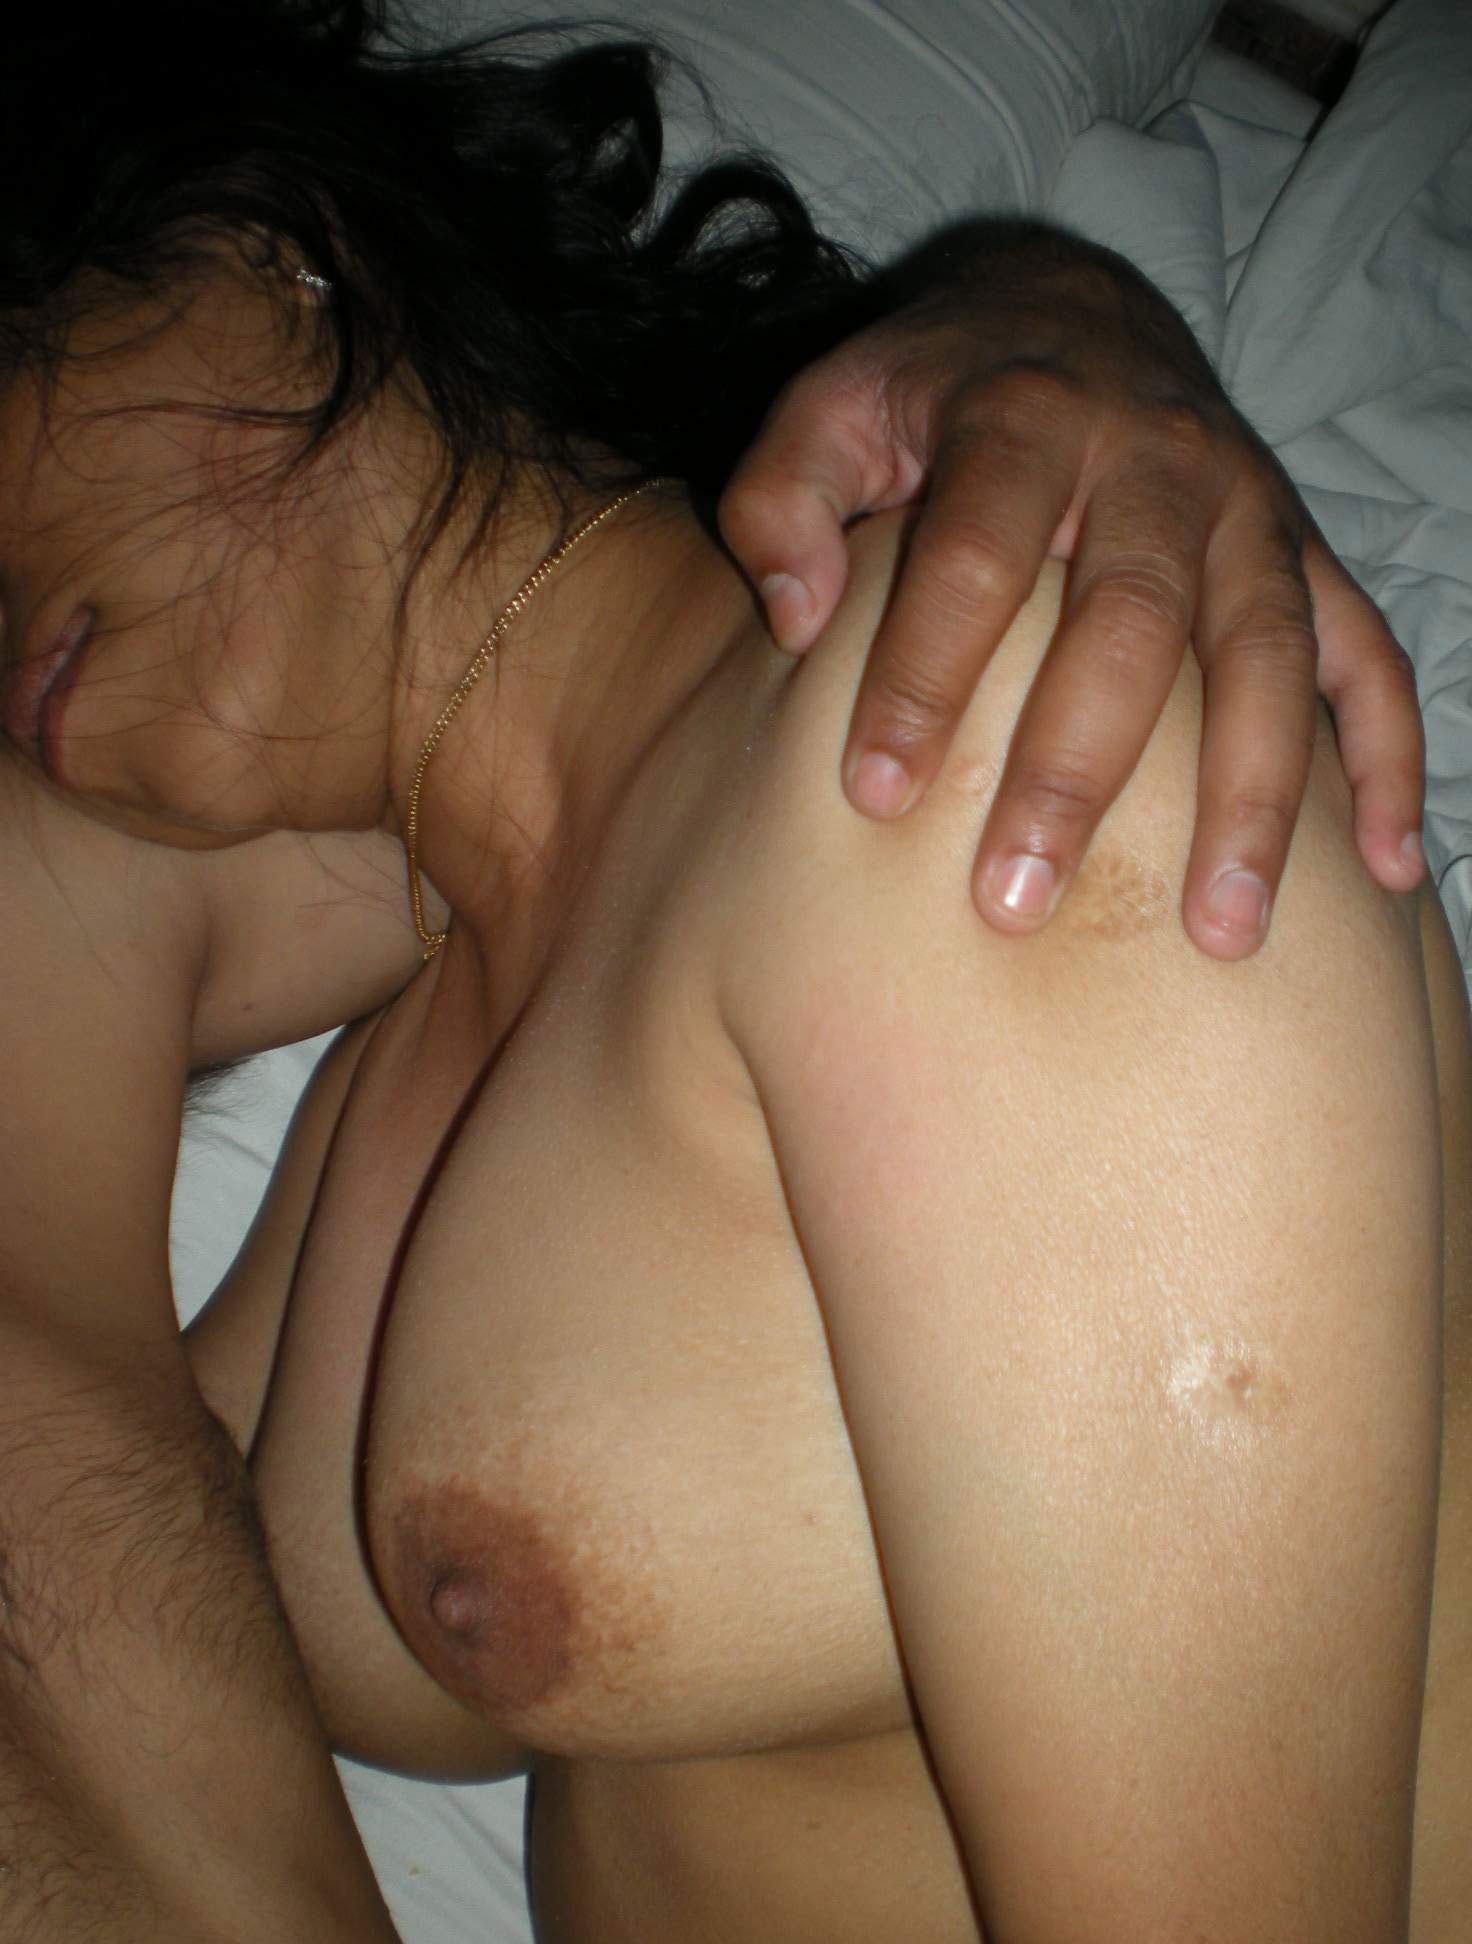 Cramp twins naked